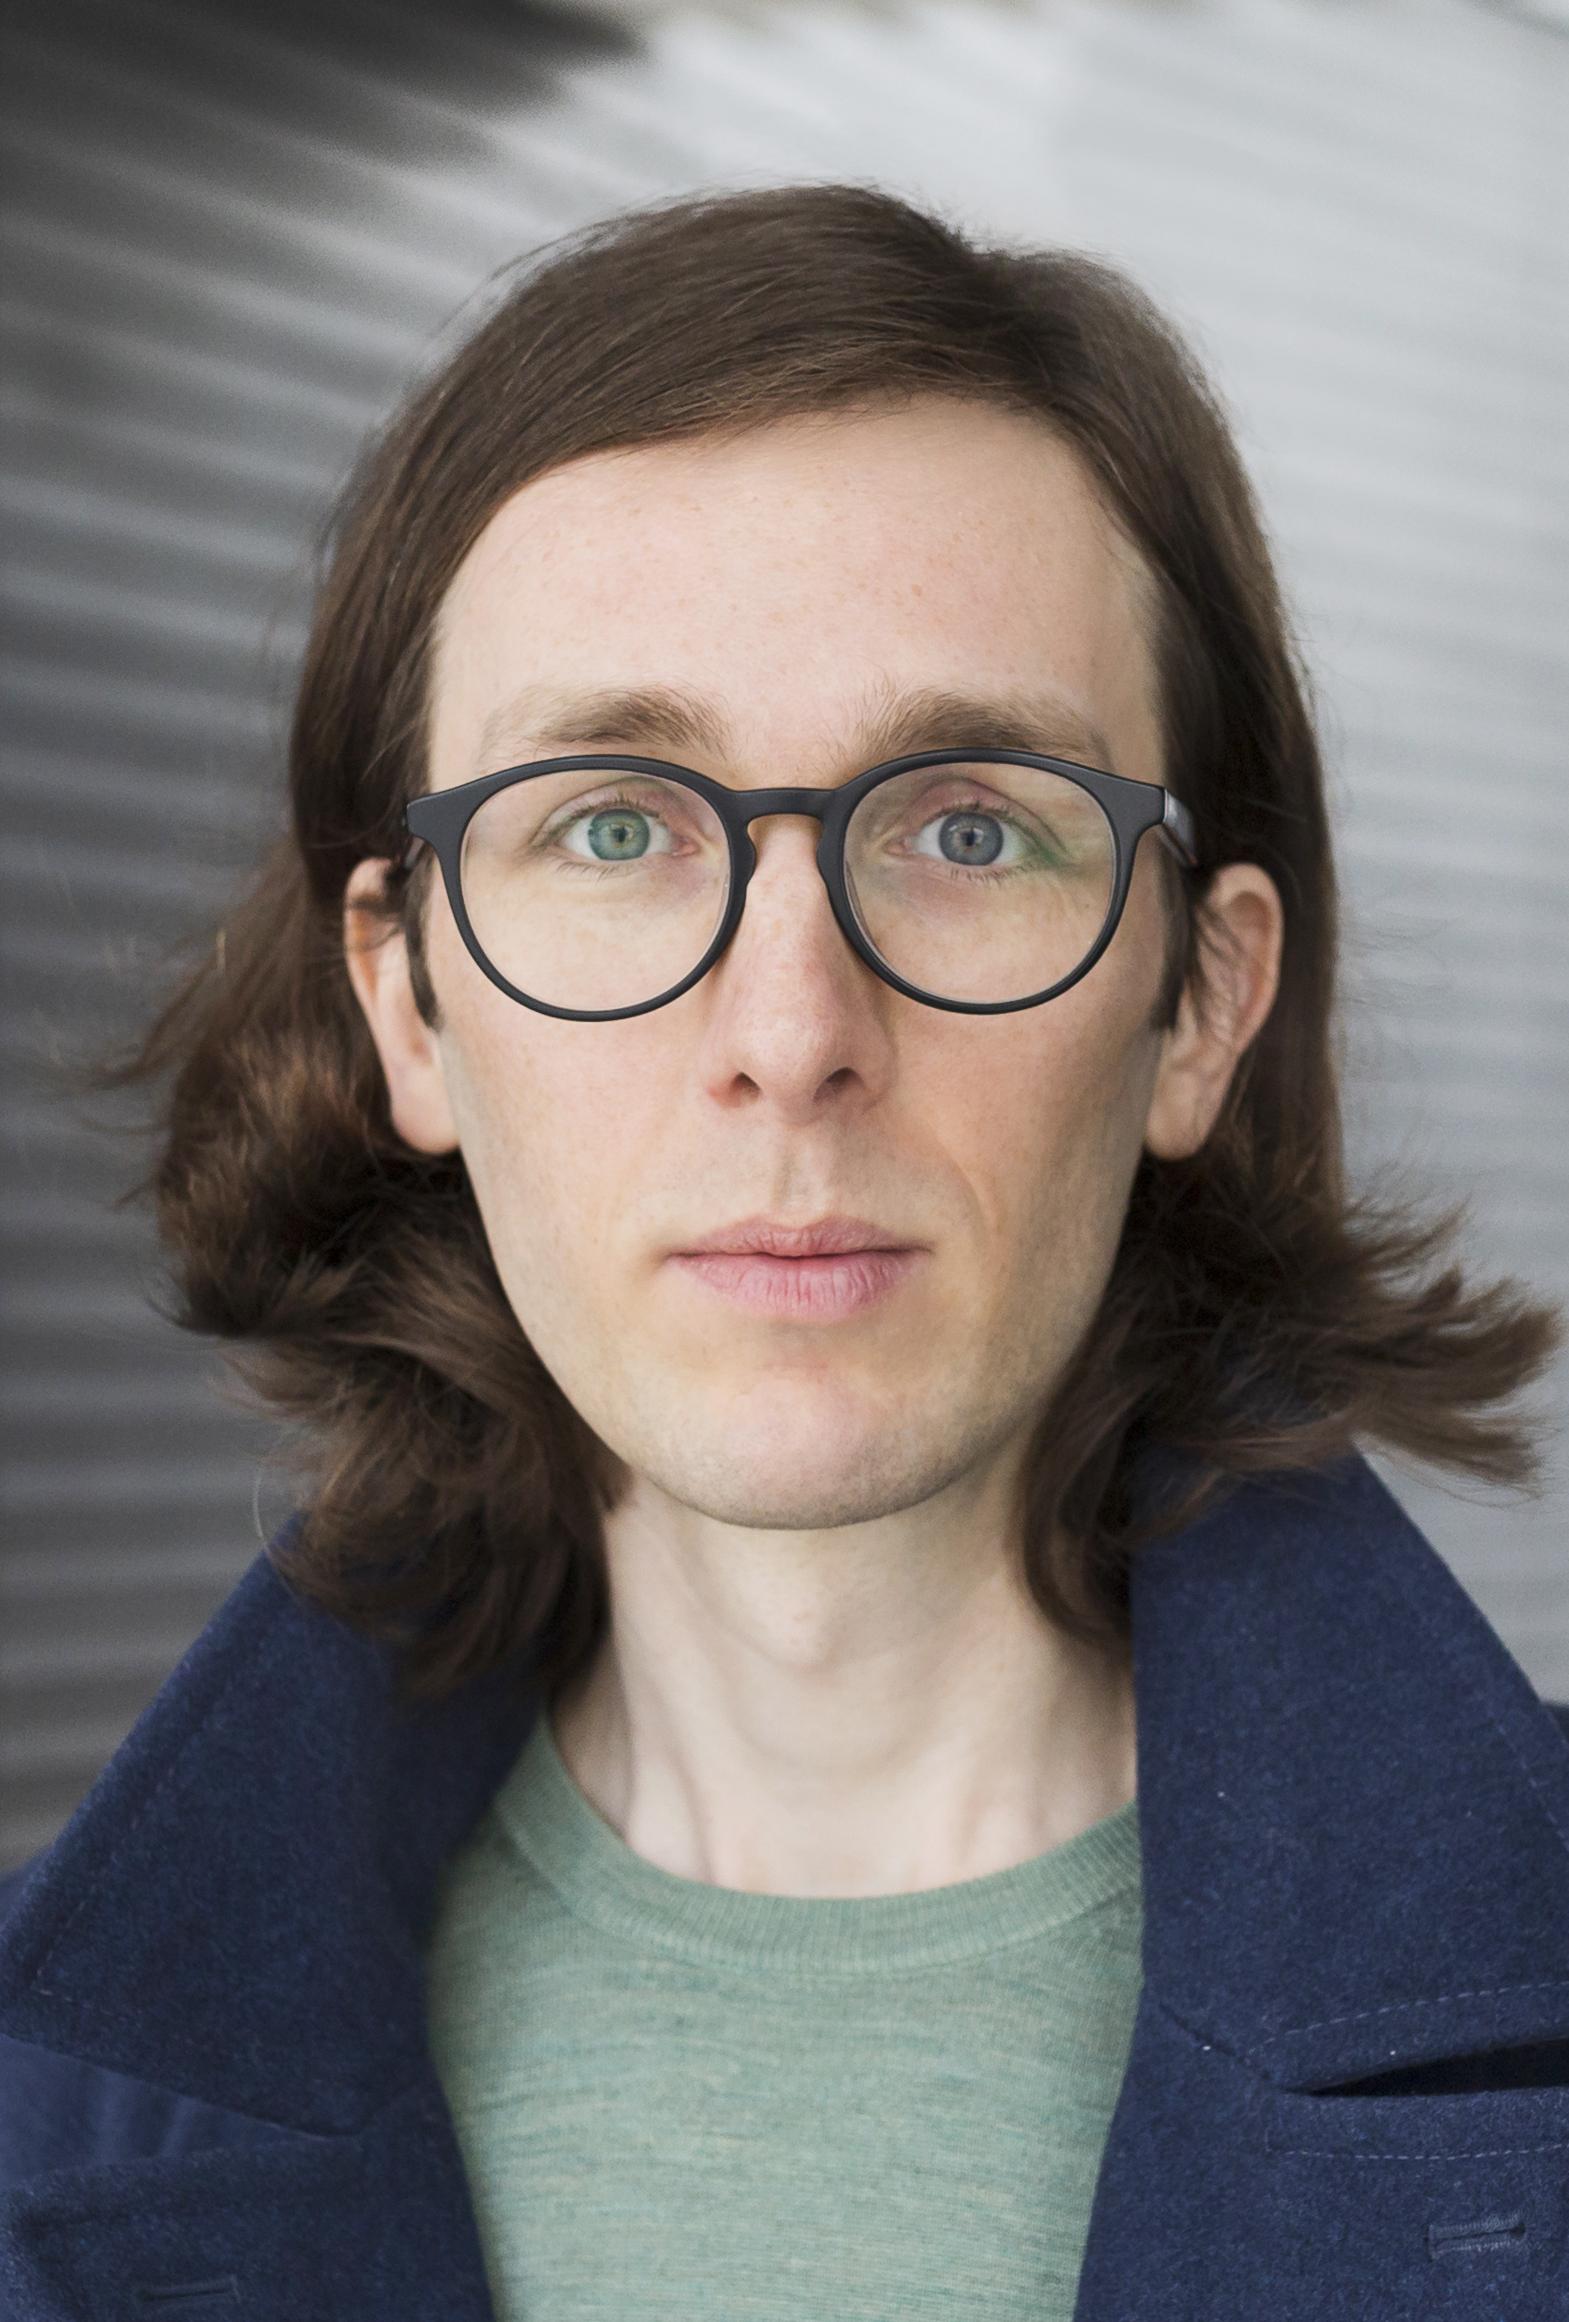 Moritz Pliquet